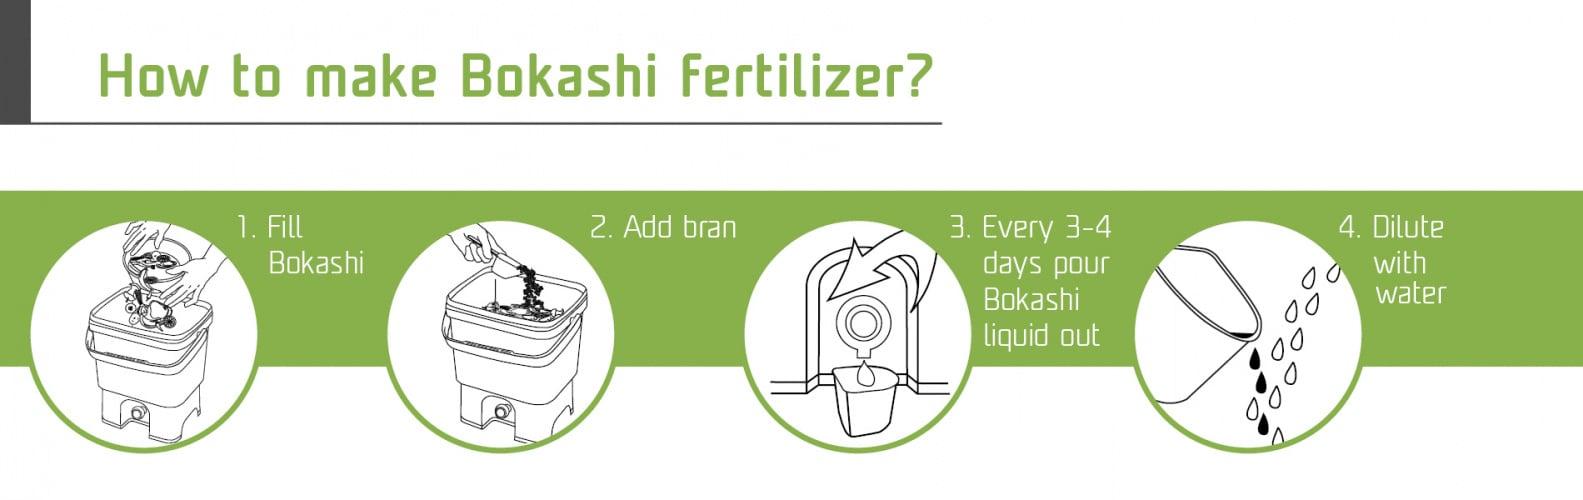 How to make Bokashi fertilizer